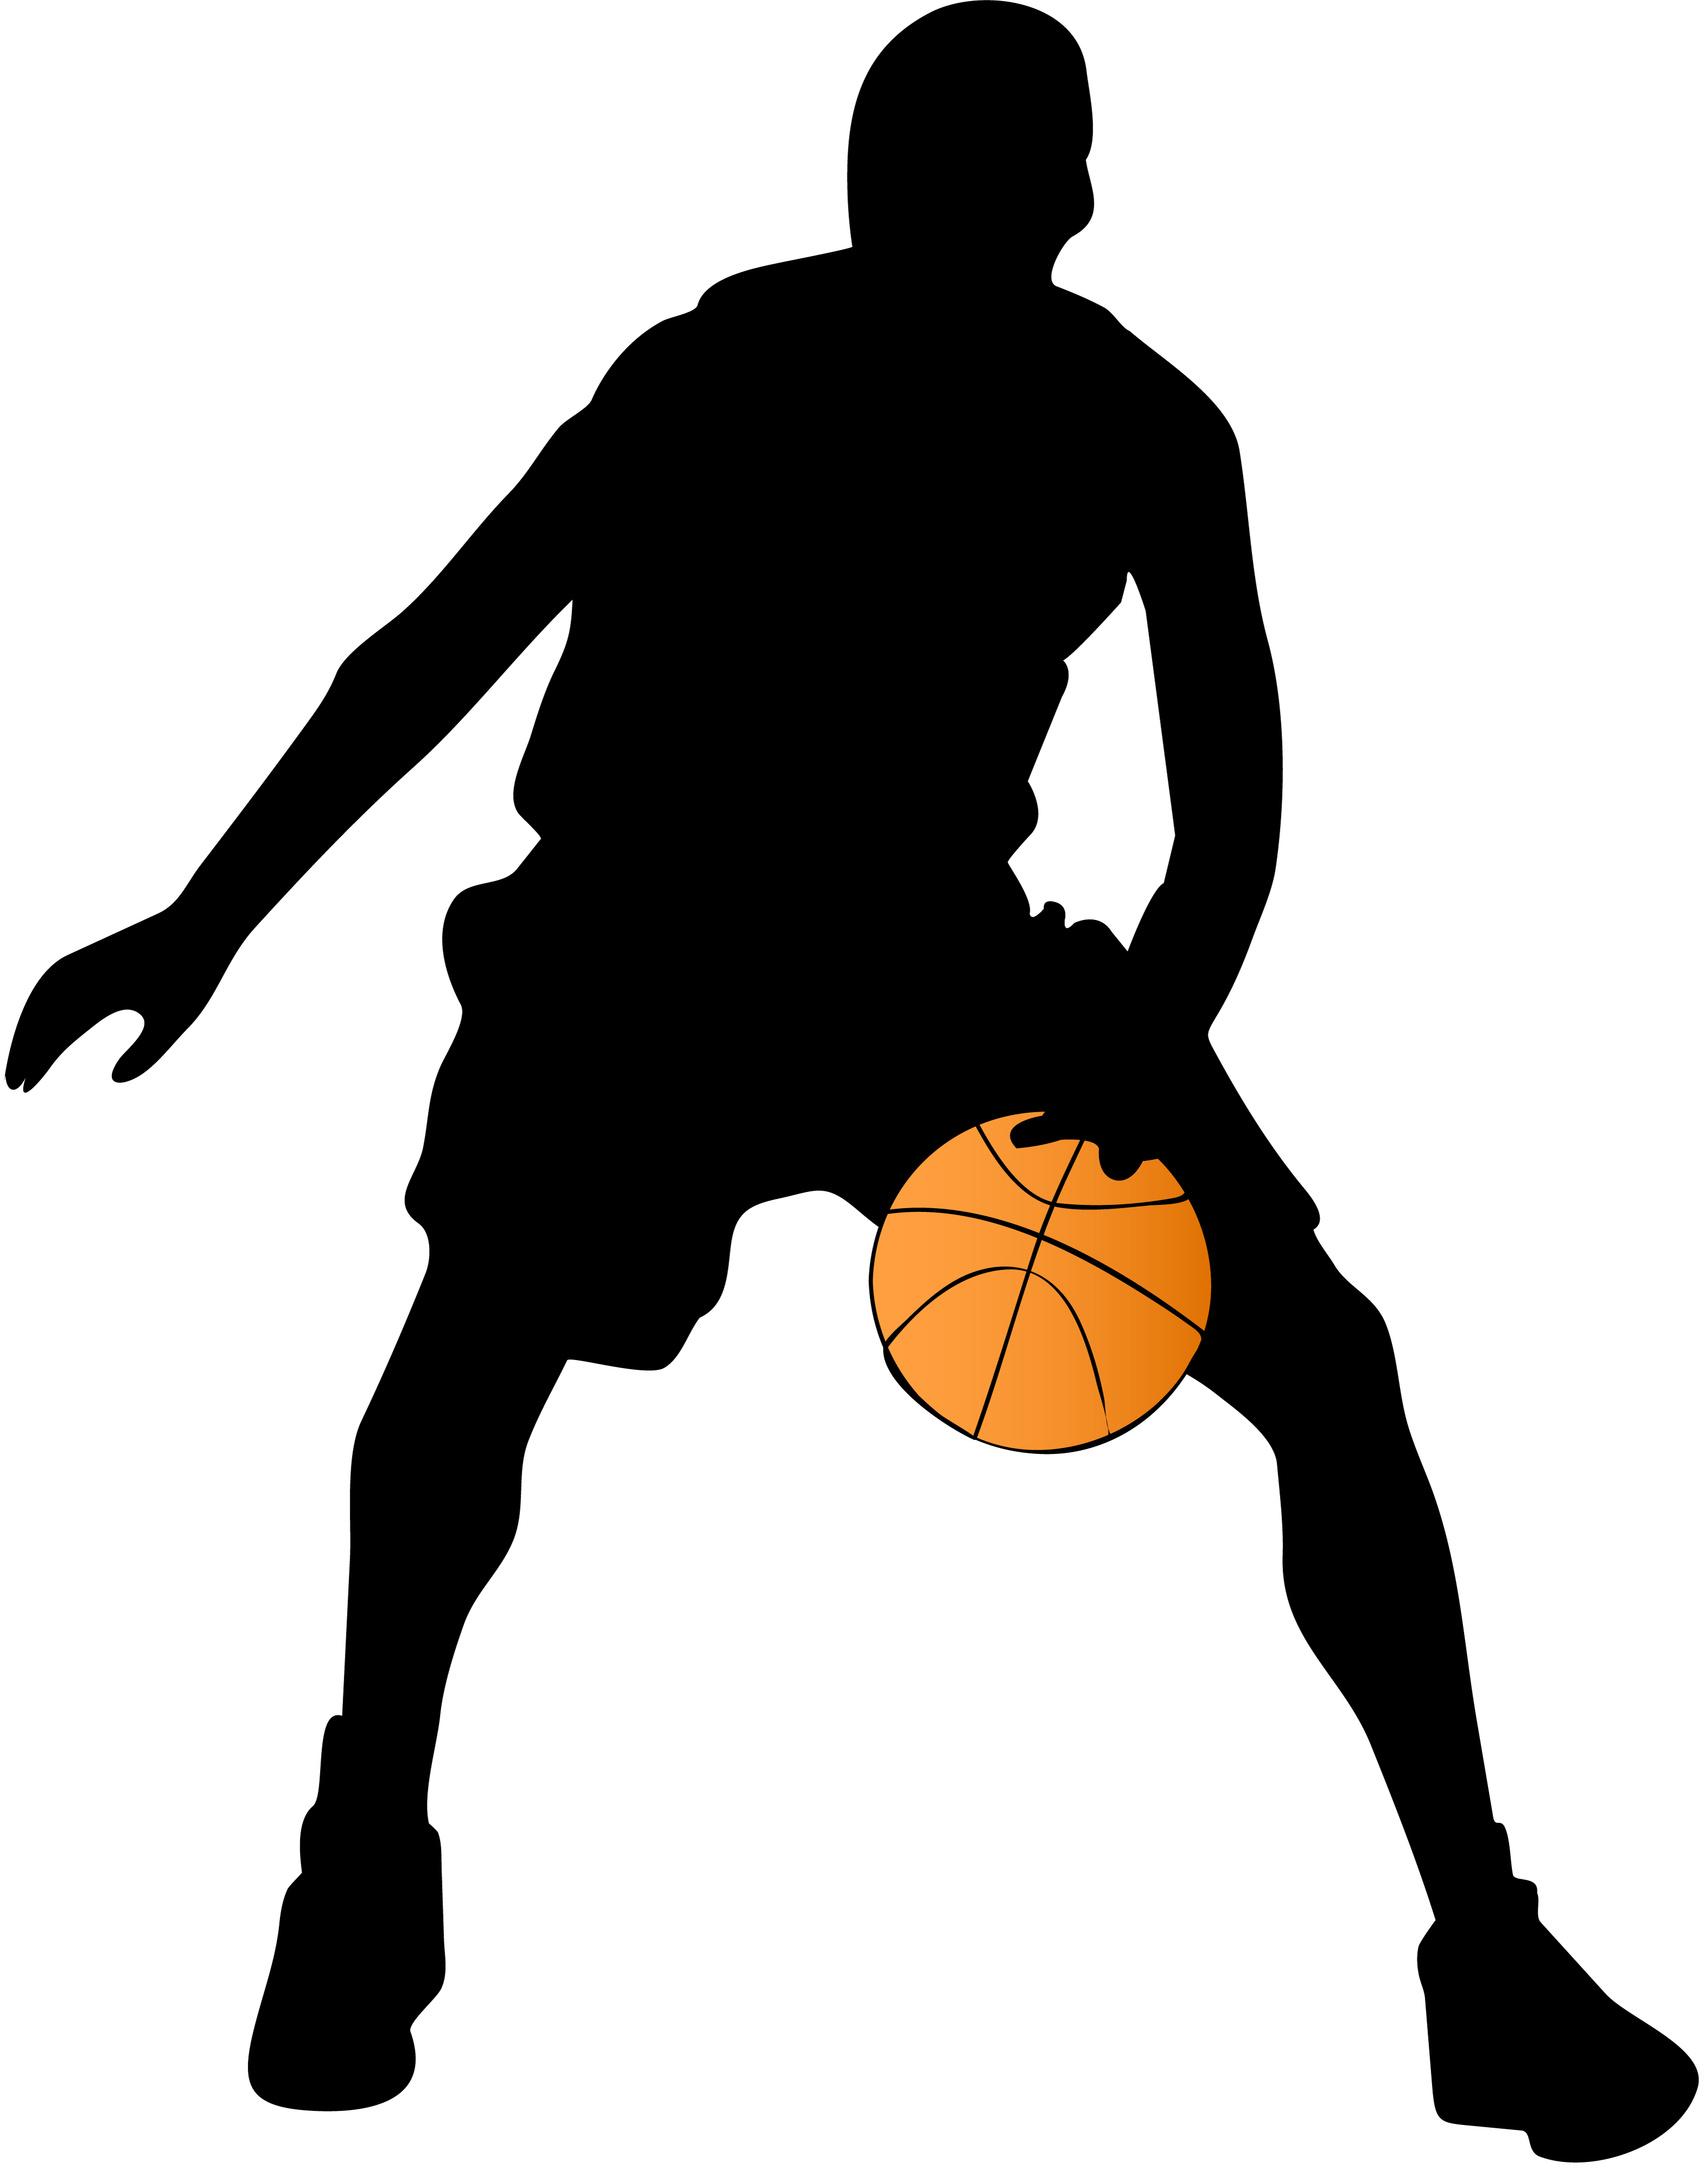 1705x2170 Basketball Player Silhouette